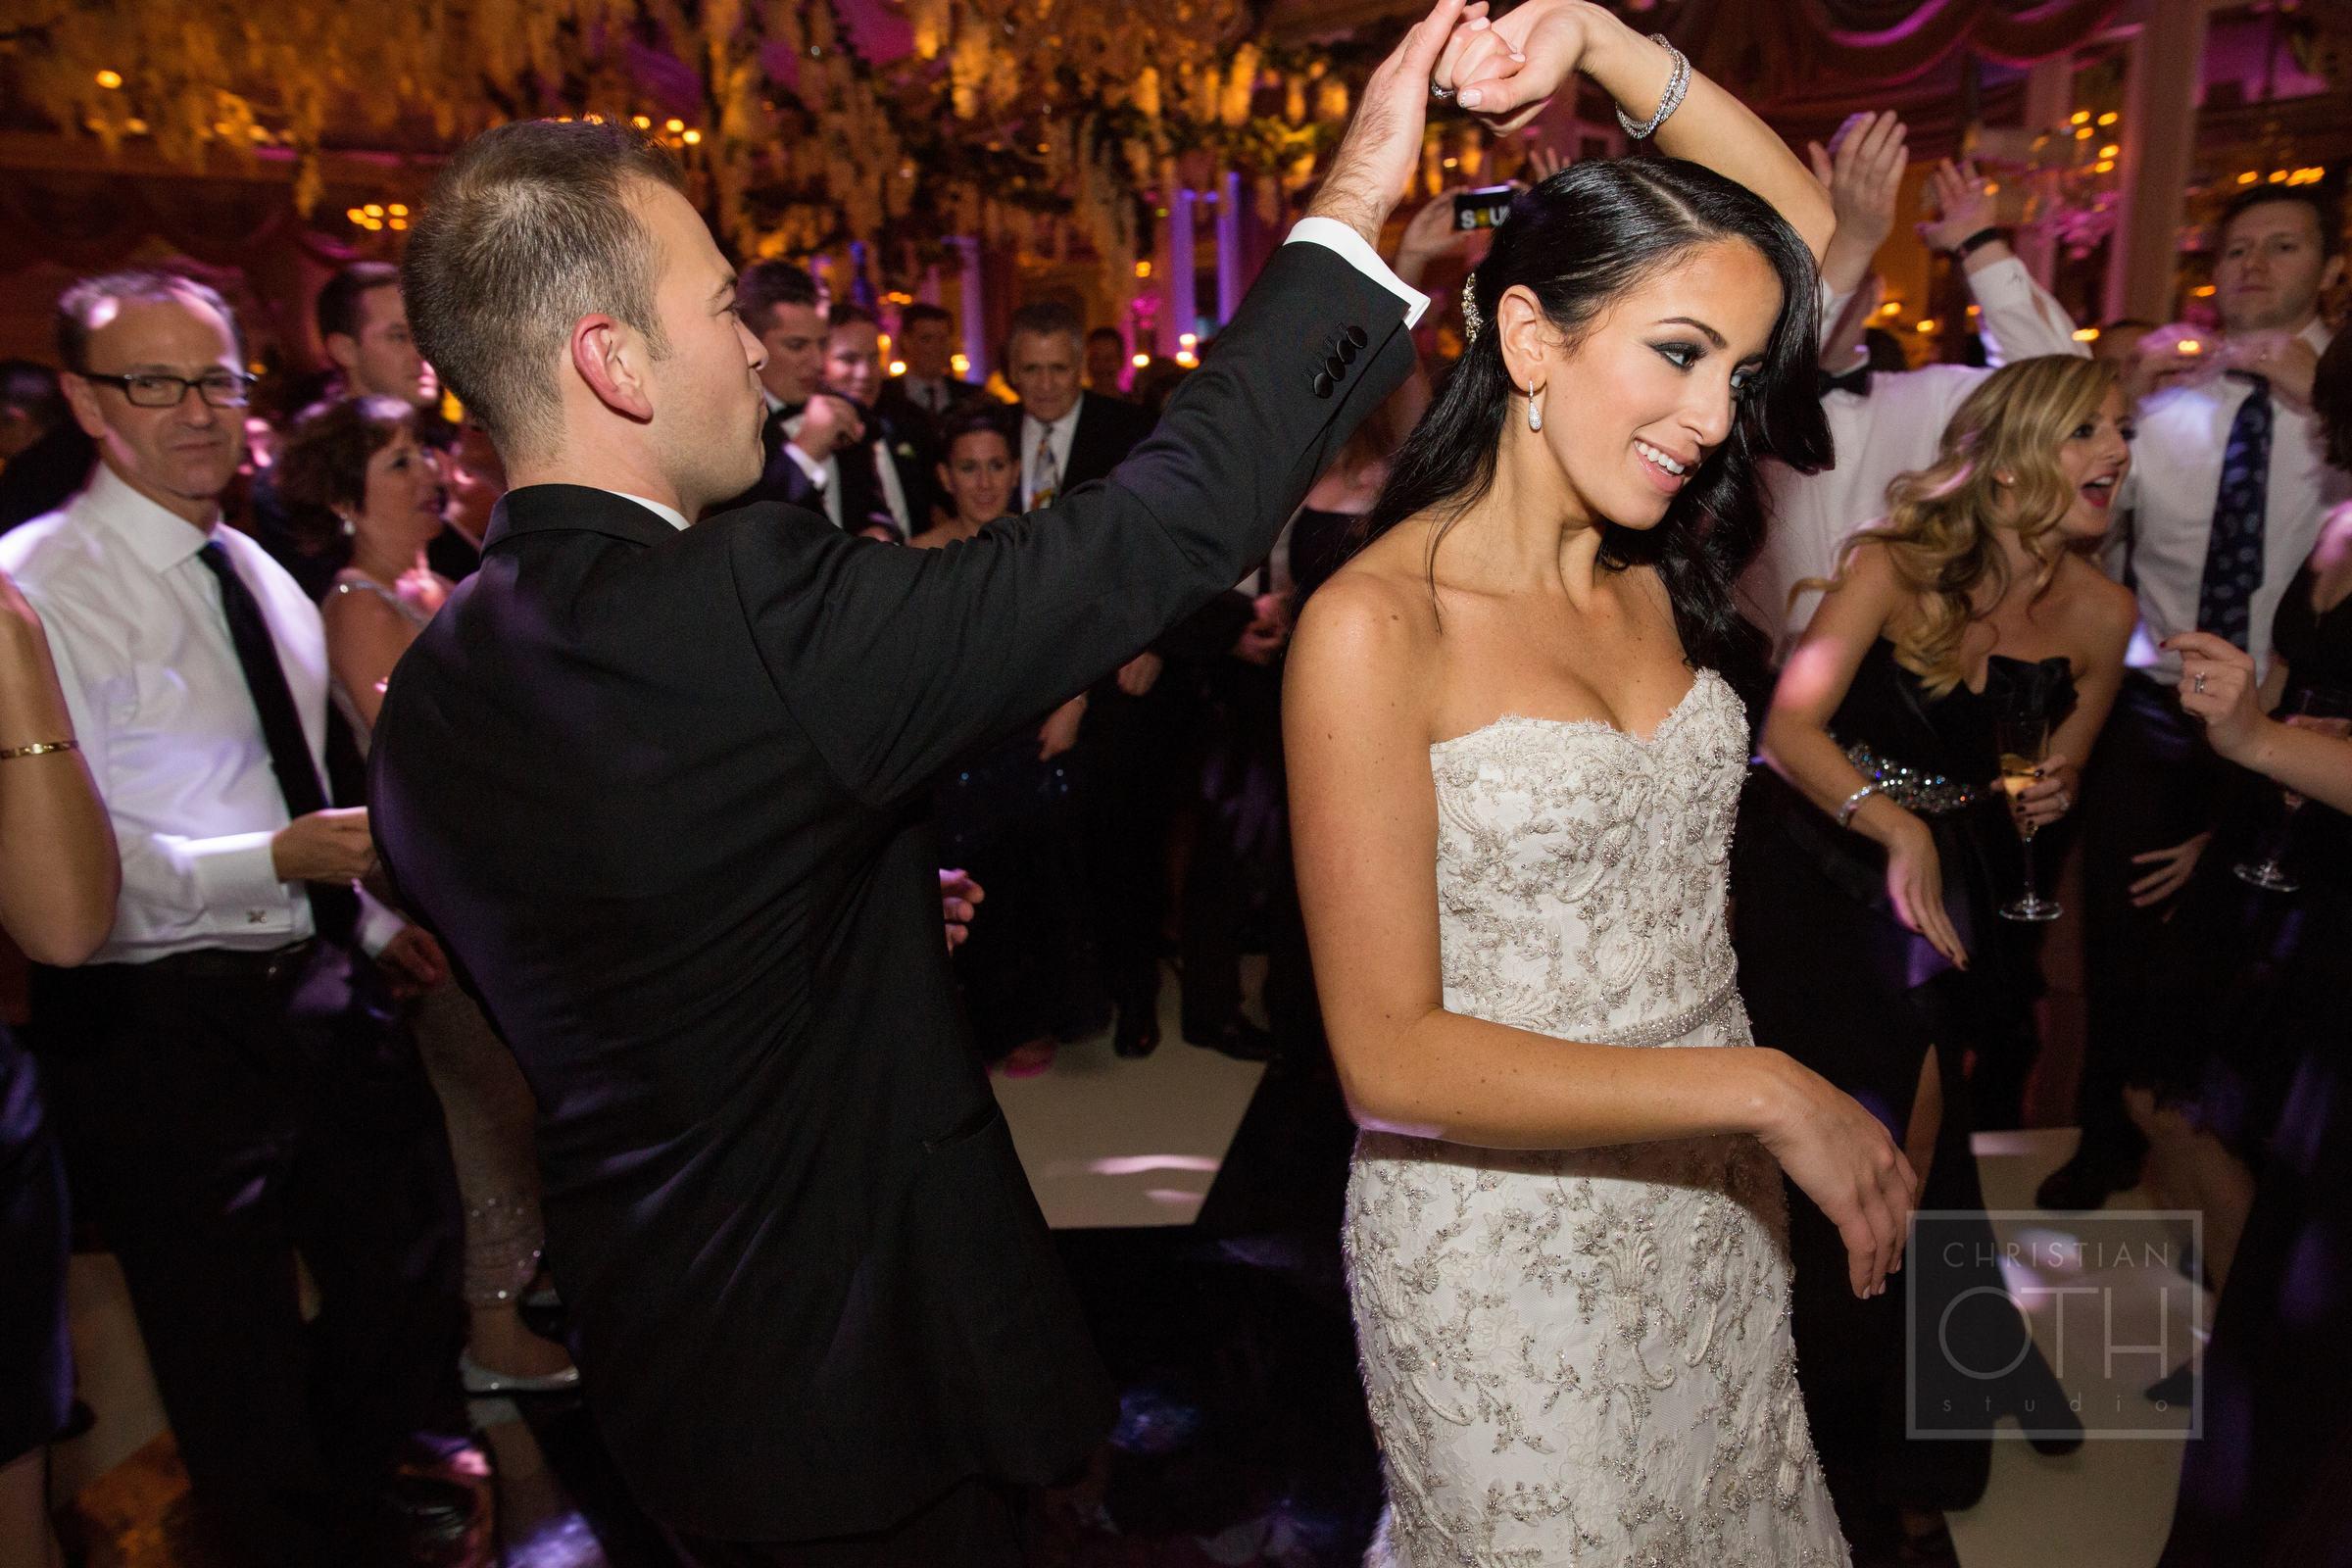 Ceci_New_York_Custom_Invitation_Pierre__City_ Destination_Wedding_Luxury_Personalized_Ceci_Style_Bride_Rose_Gold_Foil_Stamping159.JPG